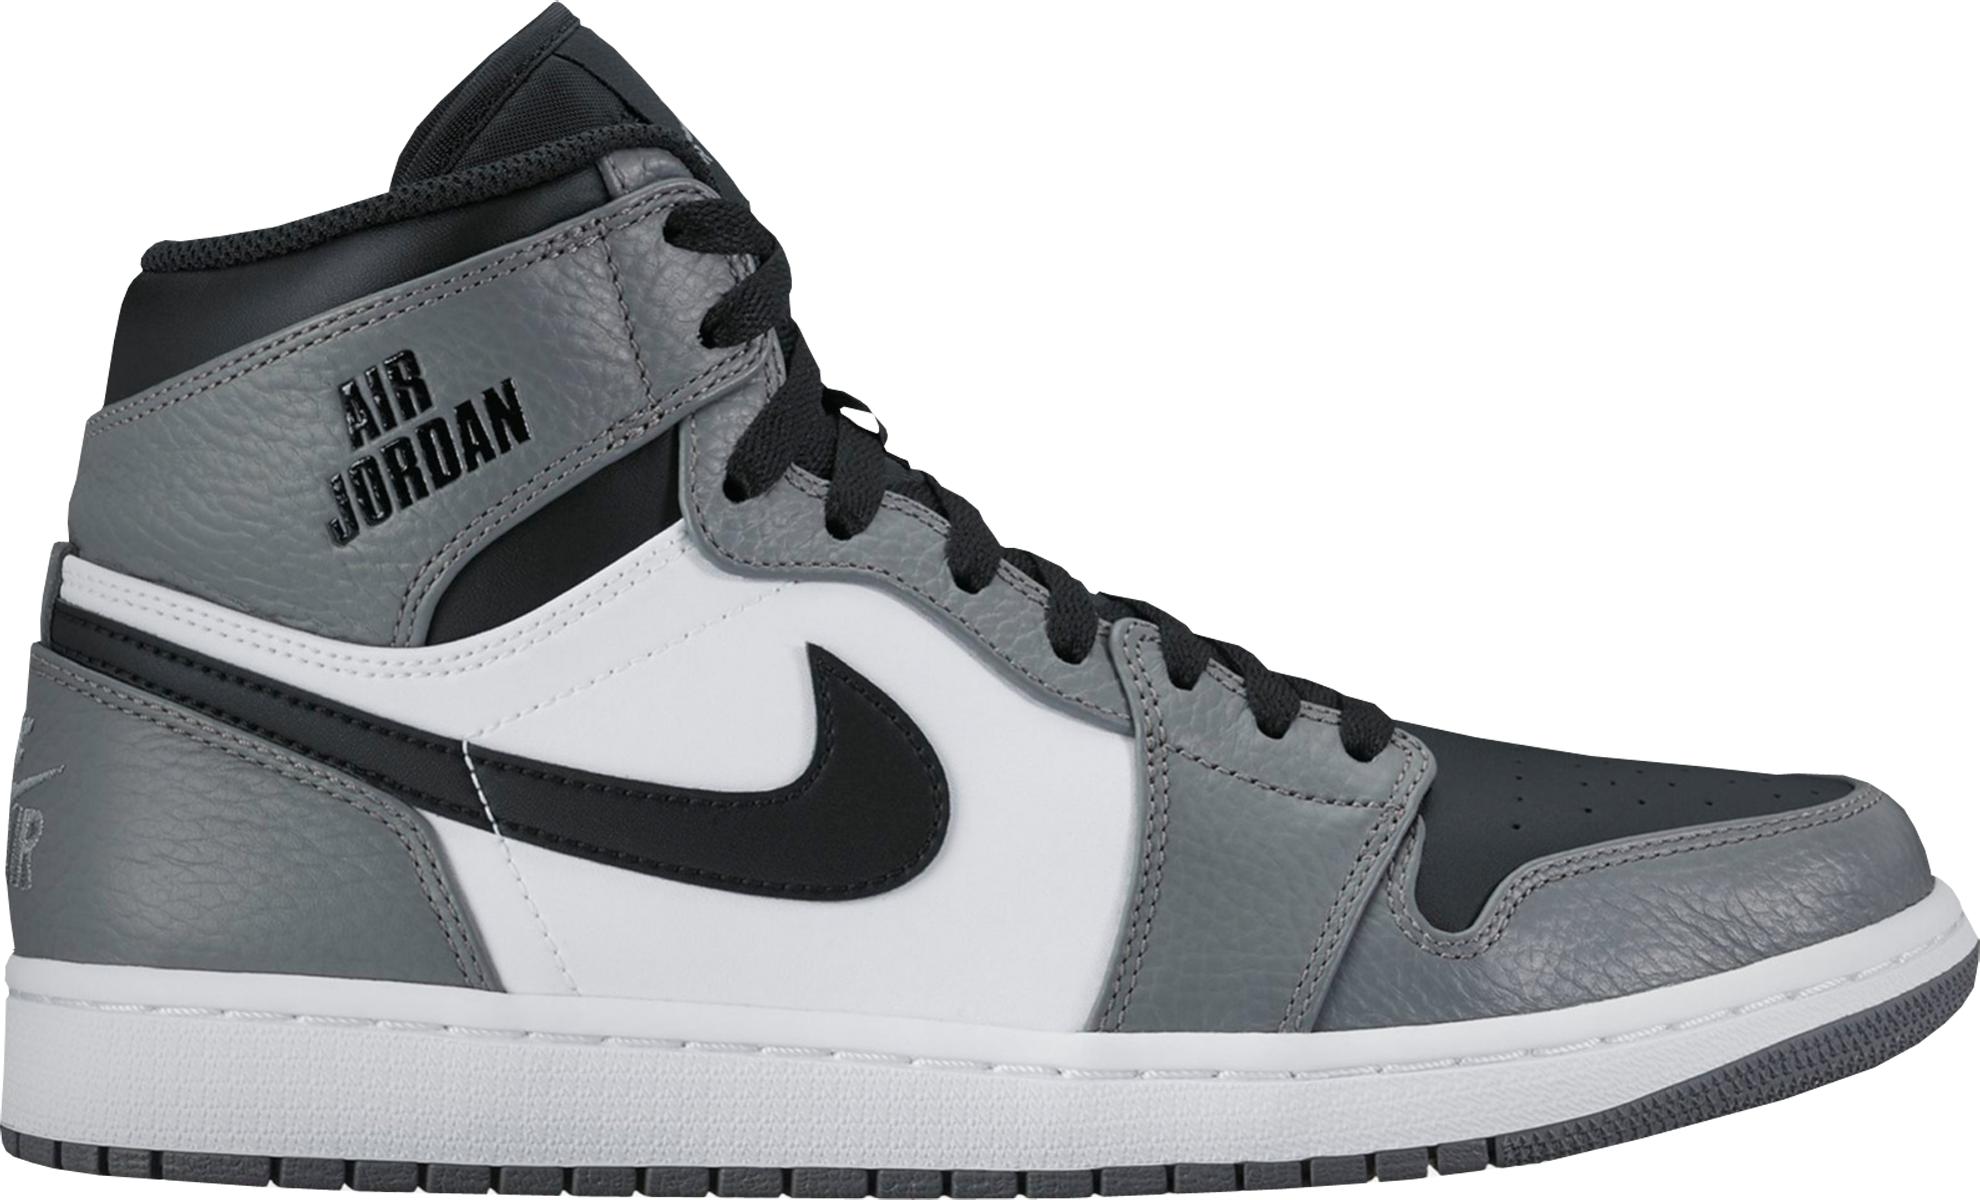 Jordan 1 Retro Rare Air Cool Grey by Stock X